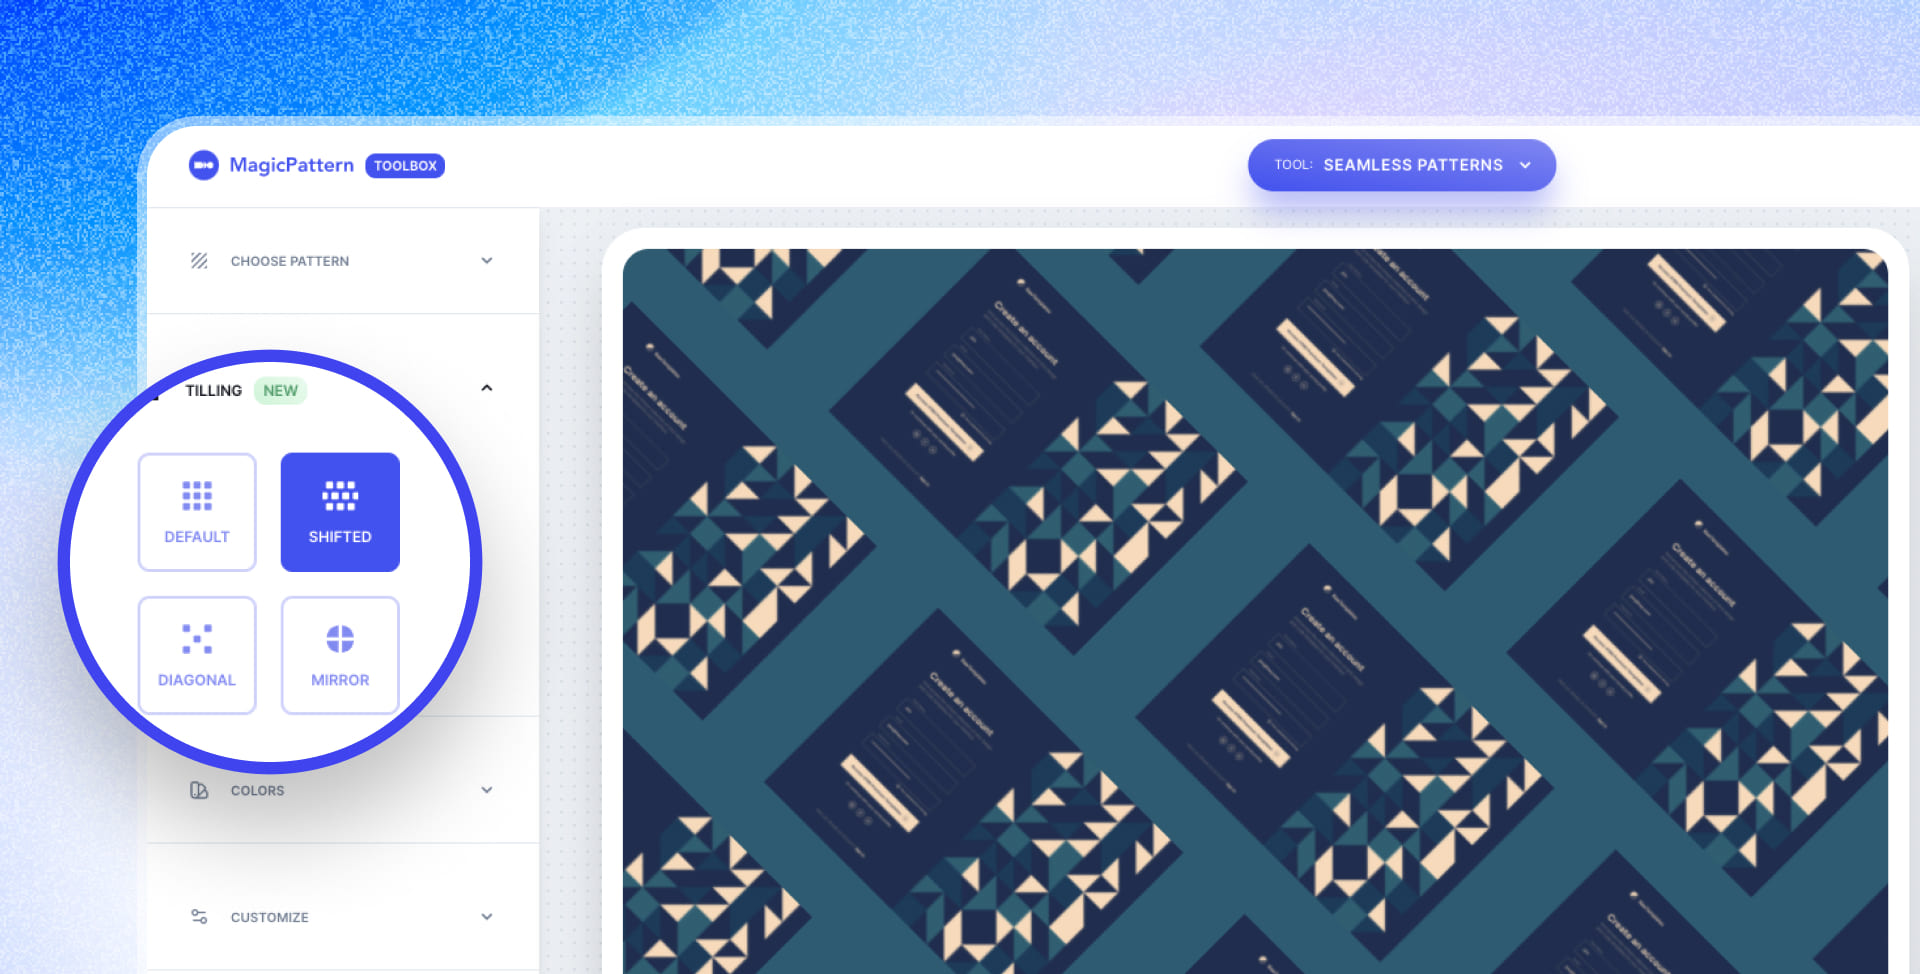 Custom Tiling for Seamless Patterns